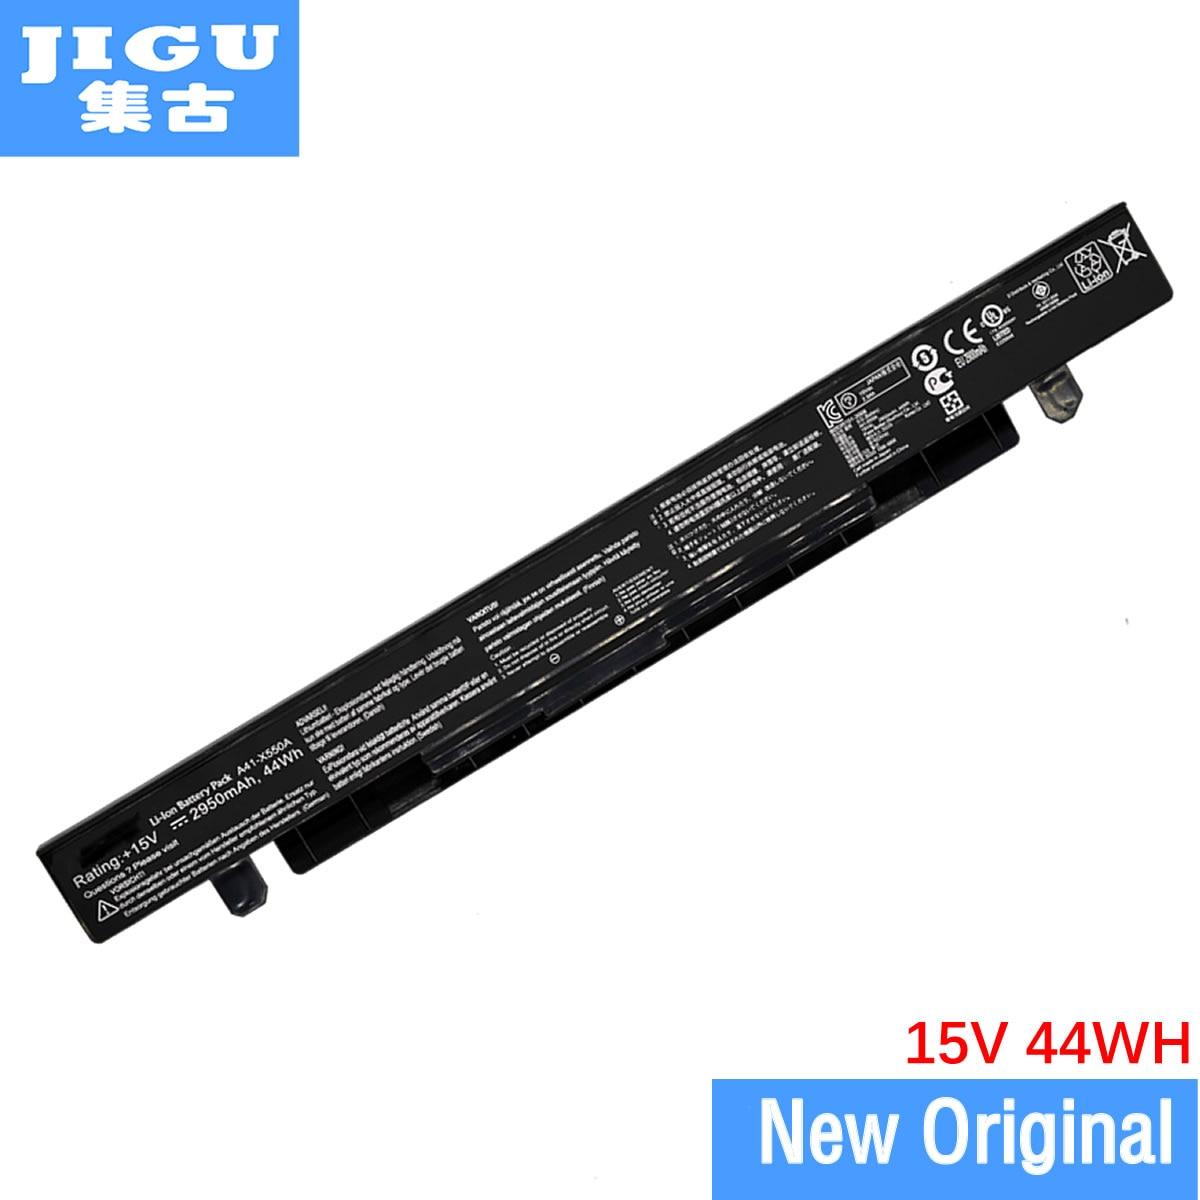 JIGU Original laptop Battery For Asus F552C F552CL F552E F552EA F552EP F552V F552VL FX50J FX50JK FX50JK4200 FX50JK4710